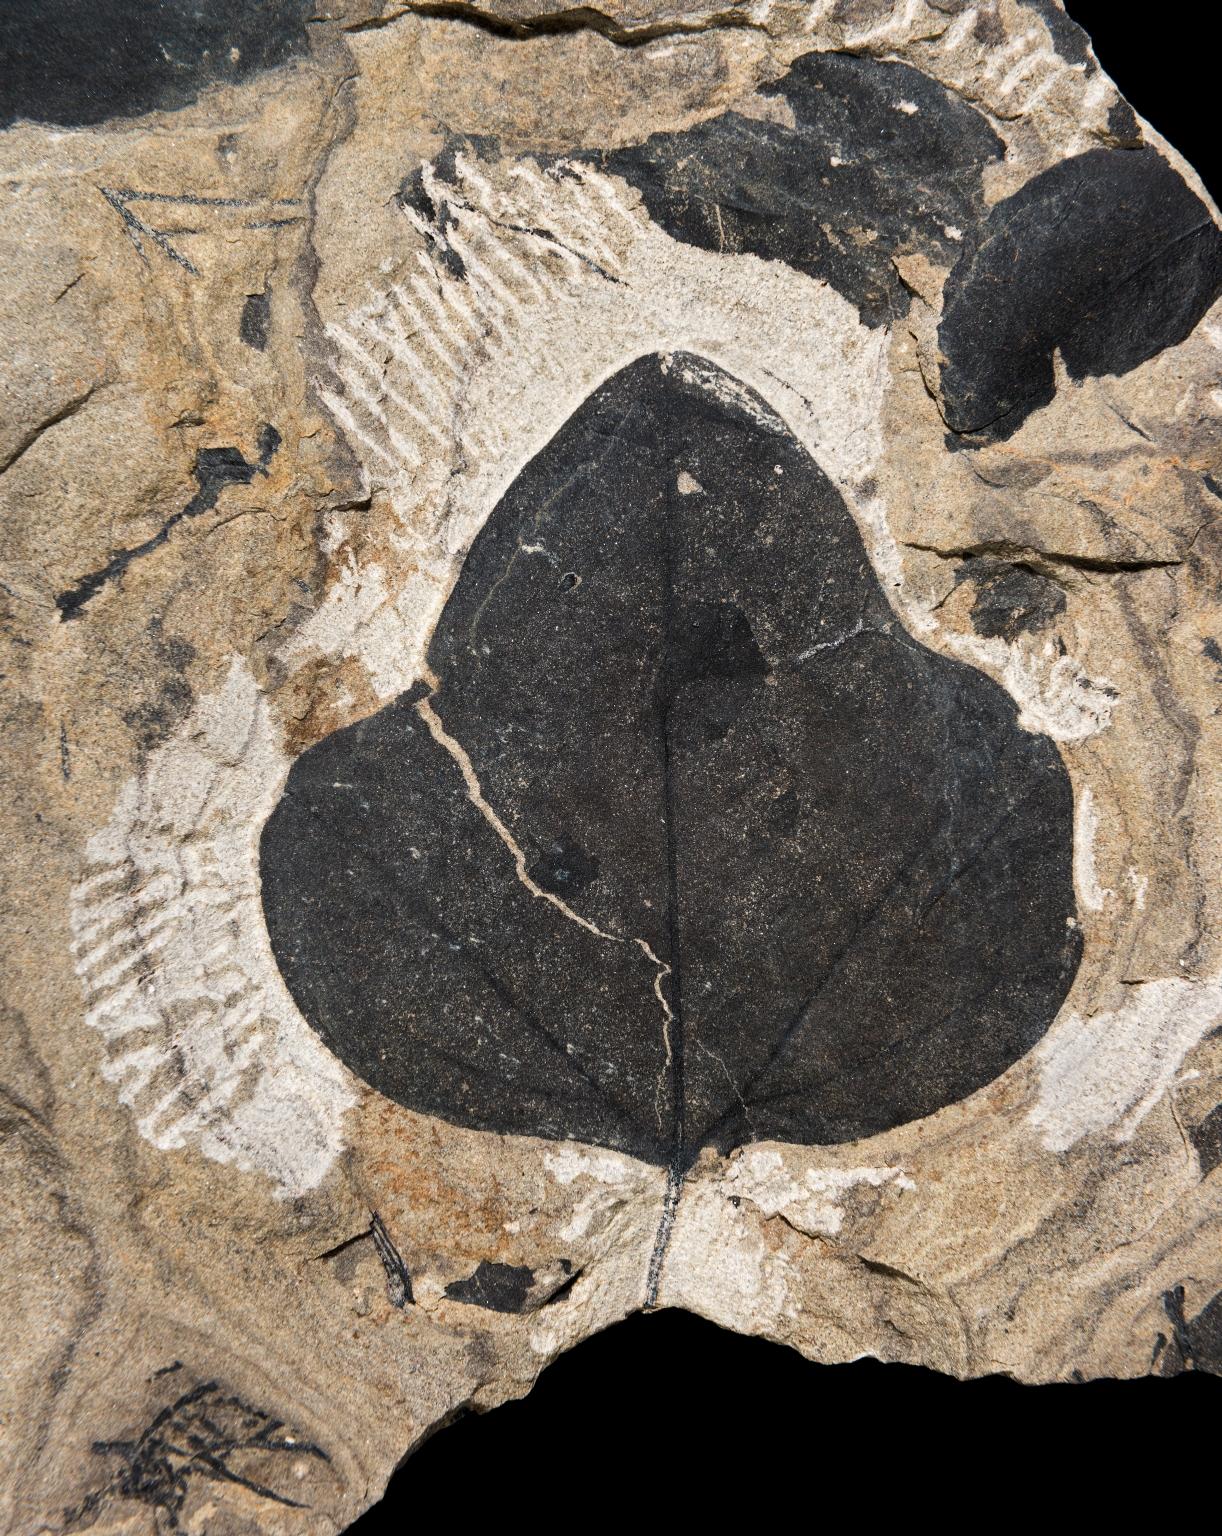 Menispermites reniformis Fossil Feaf